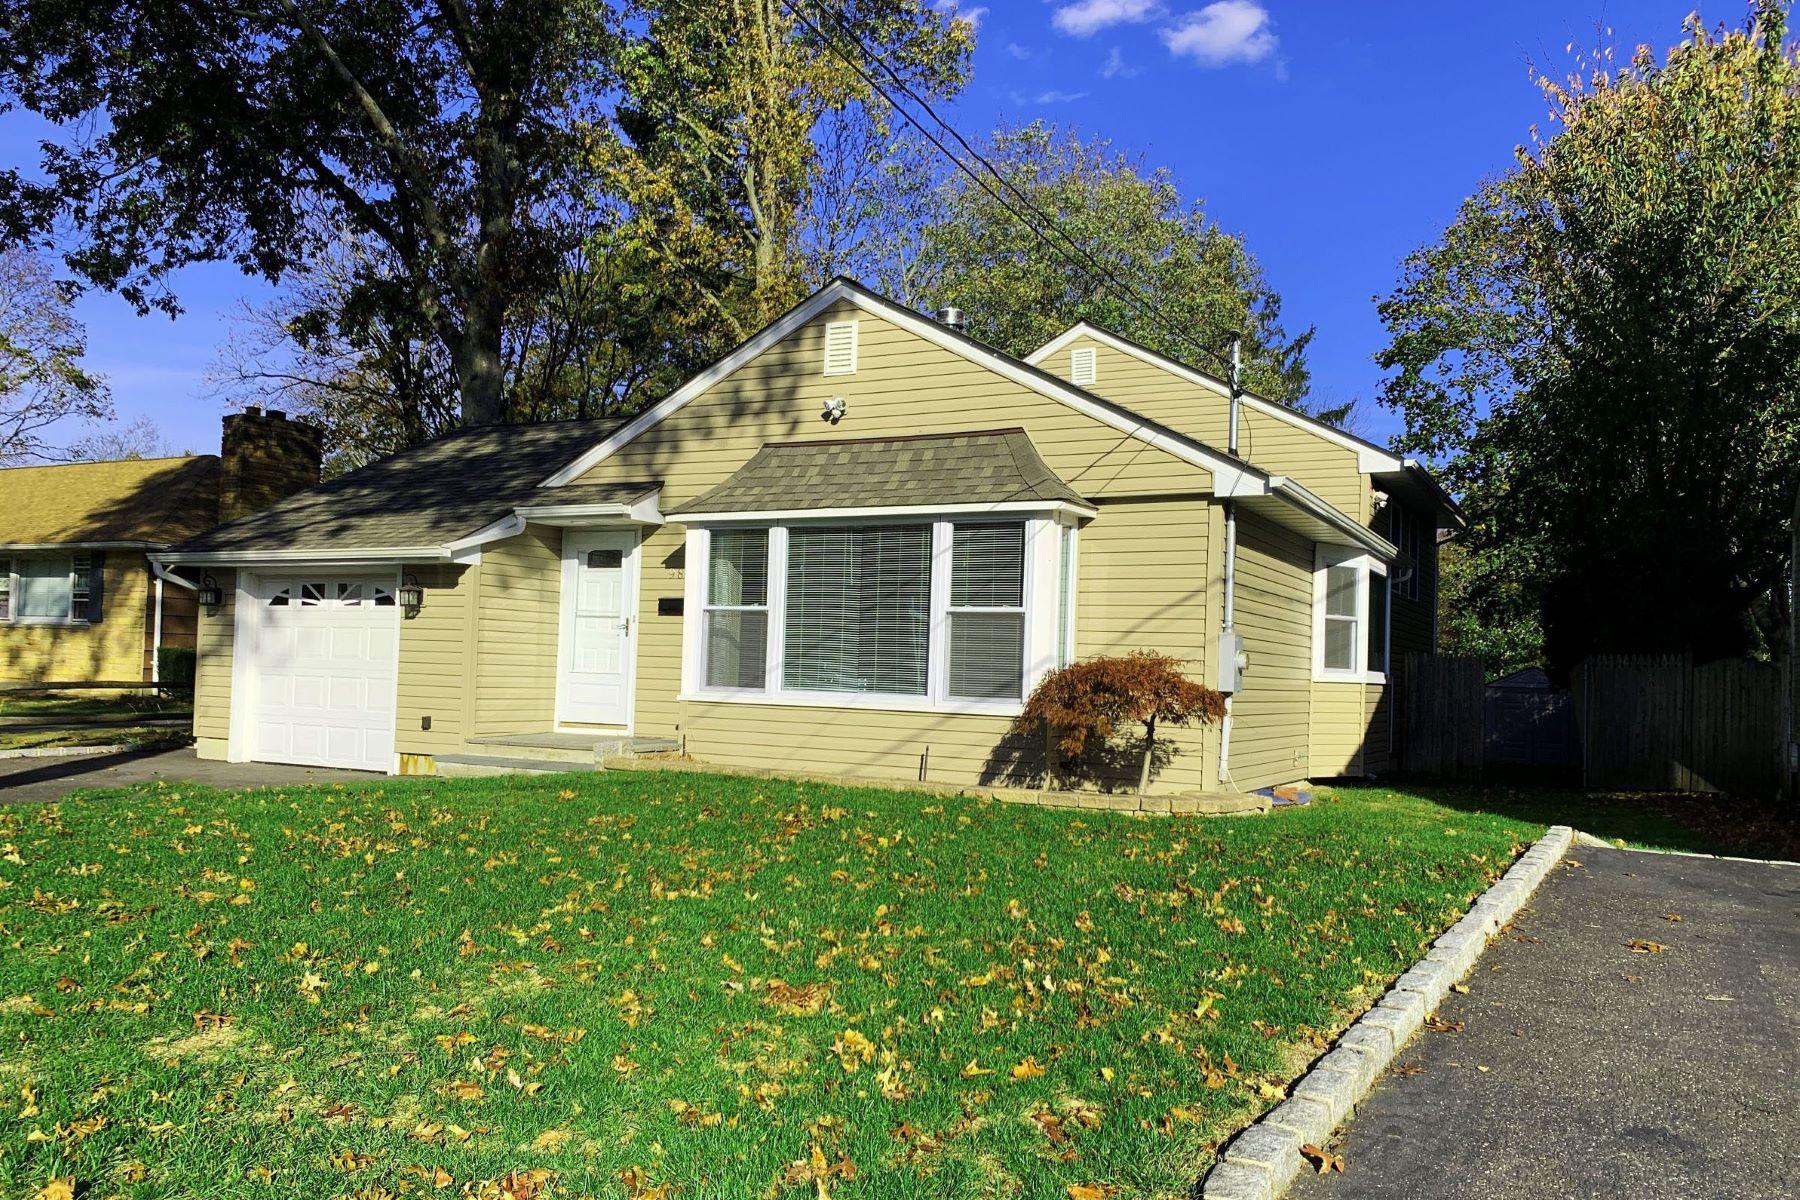 Single Family Homes for Sale at Huntington Sta 98 Lodge Huntington Station, New York 11746 United States